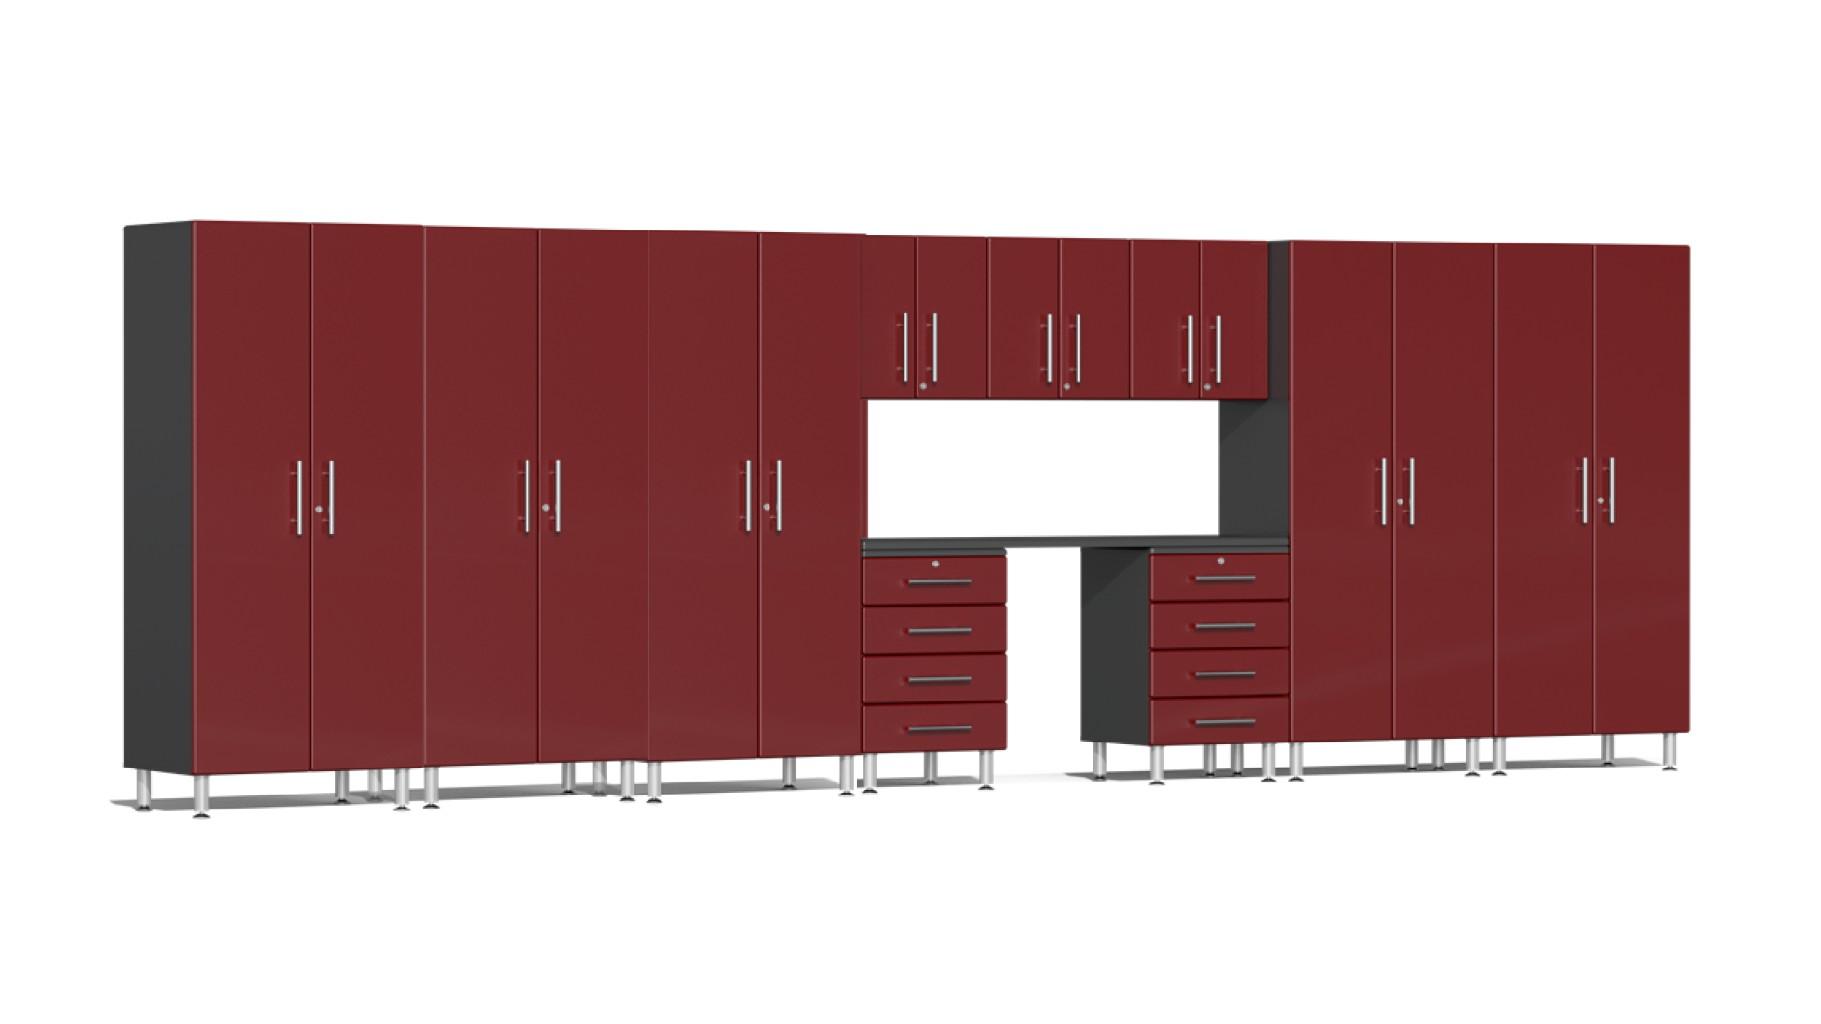 Ulti-MATE Garage 2.0 Series 11-Piece Kit with Workstation in Red Metallic UG23111R